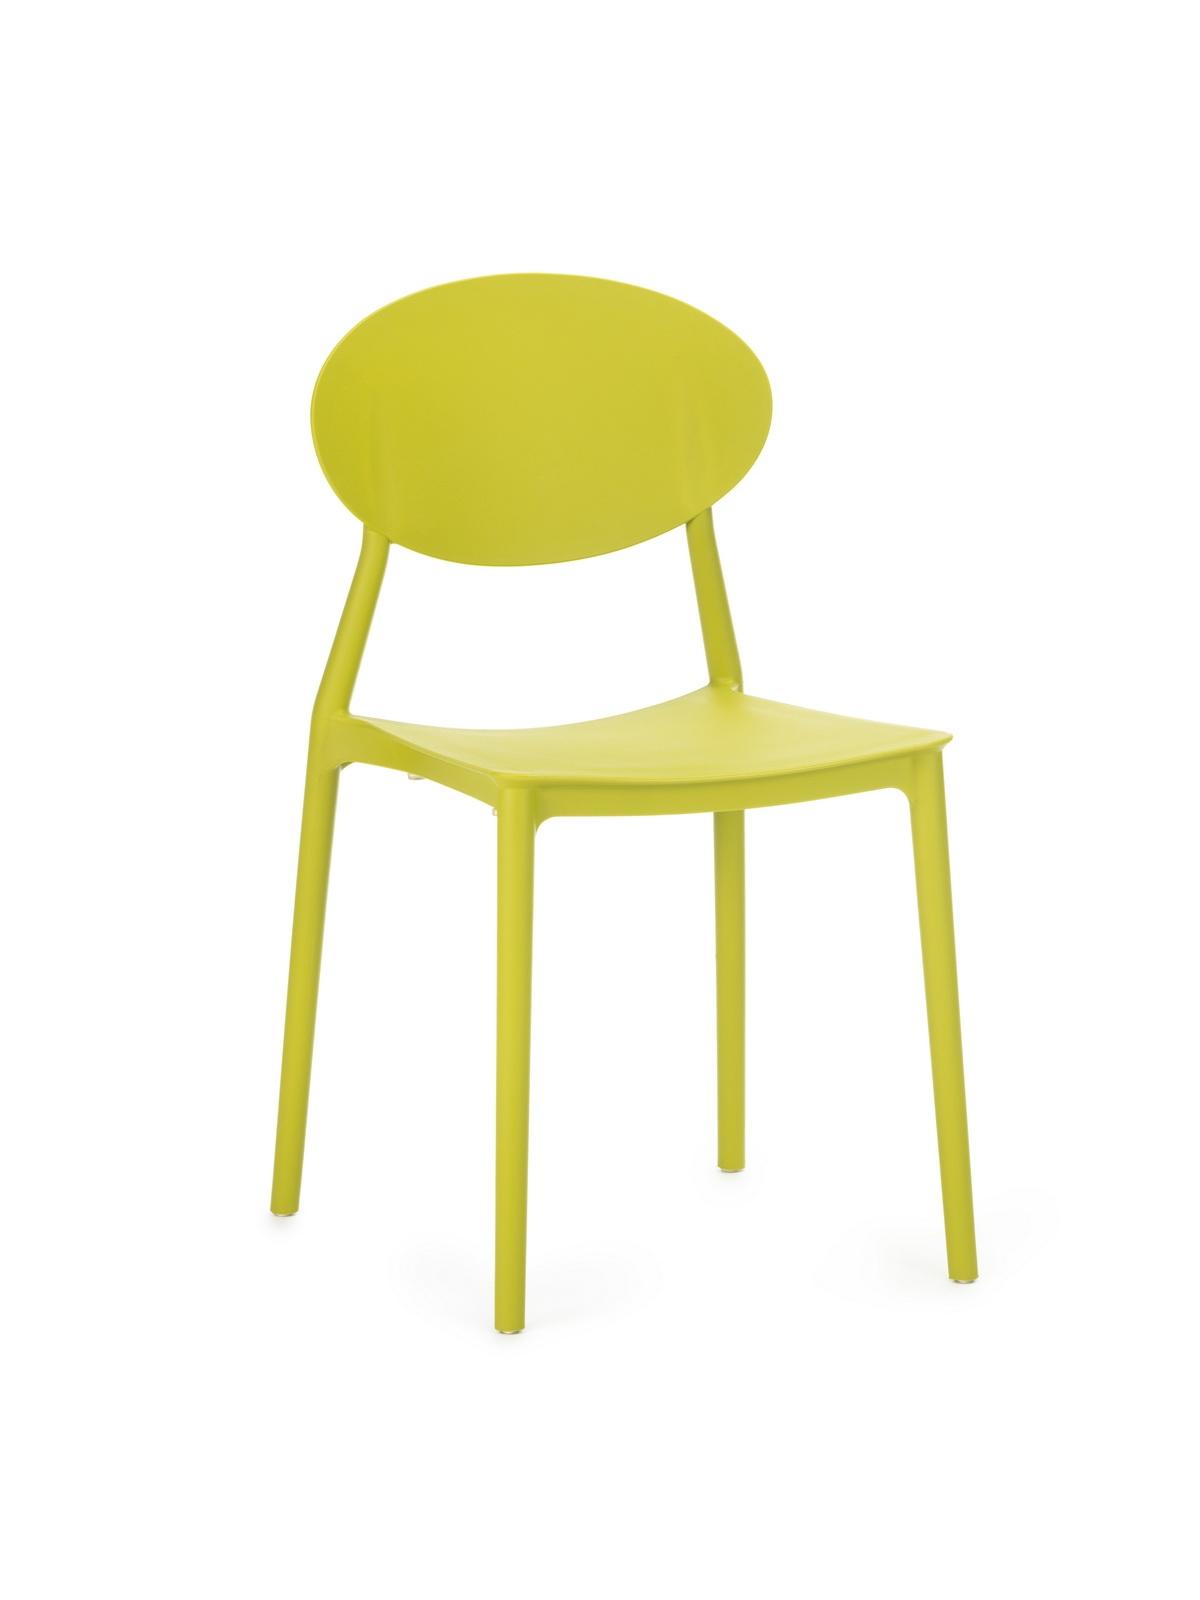 Scaun din plastic, cu picioare din plastic Lolita Green, l47xA42xH82cm imagine